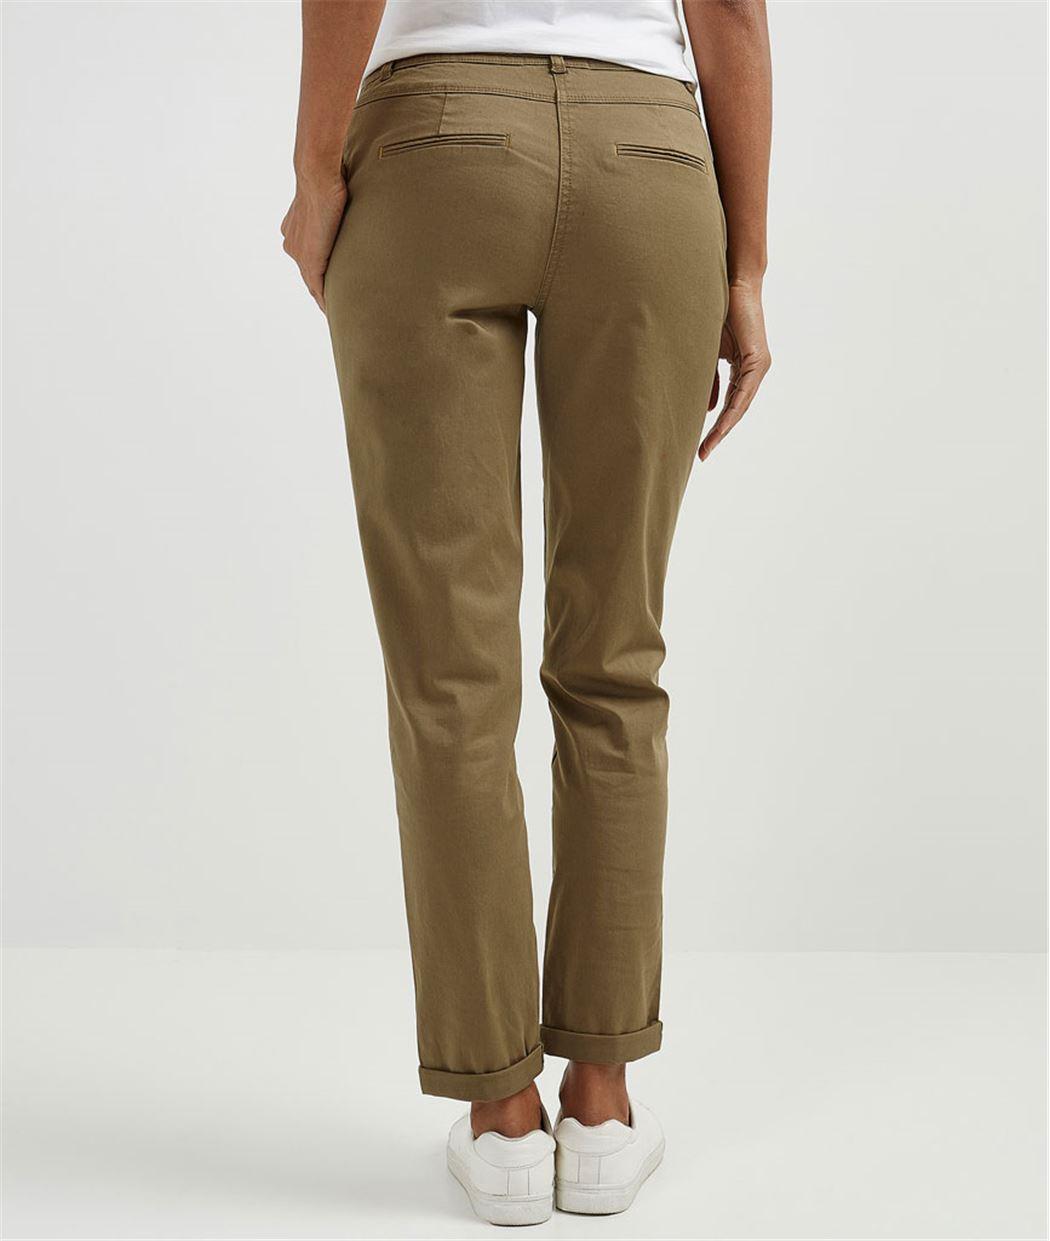 Pantalon femme chino avec ceinture KAKI - Grain de Malice f0c732aa435